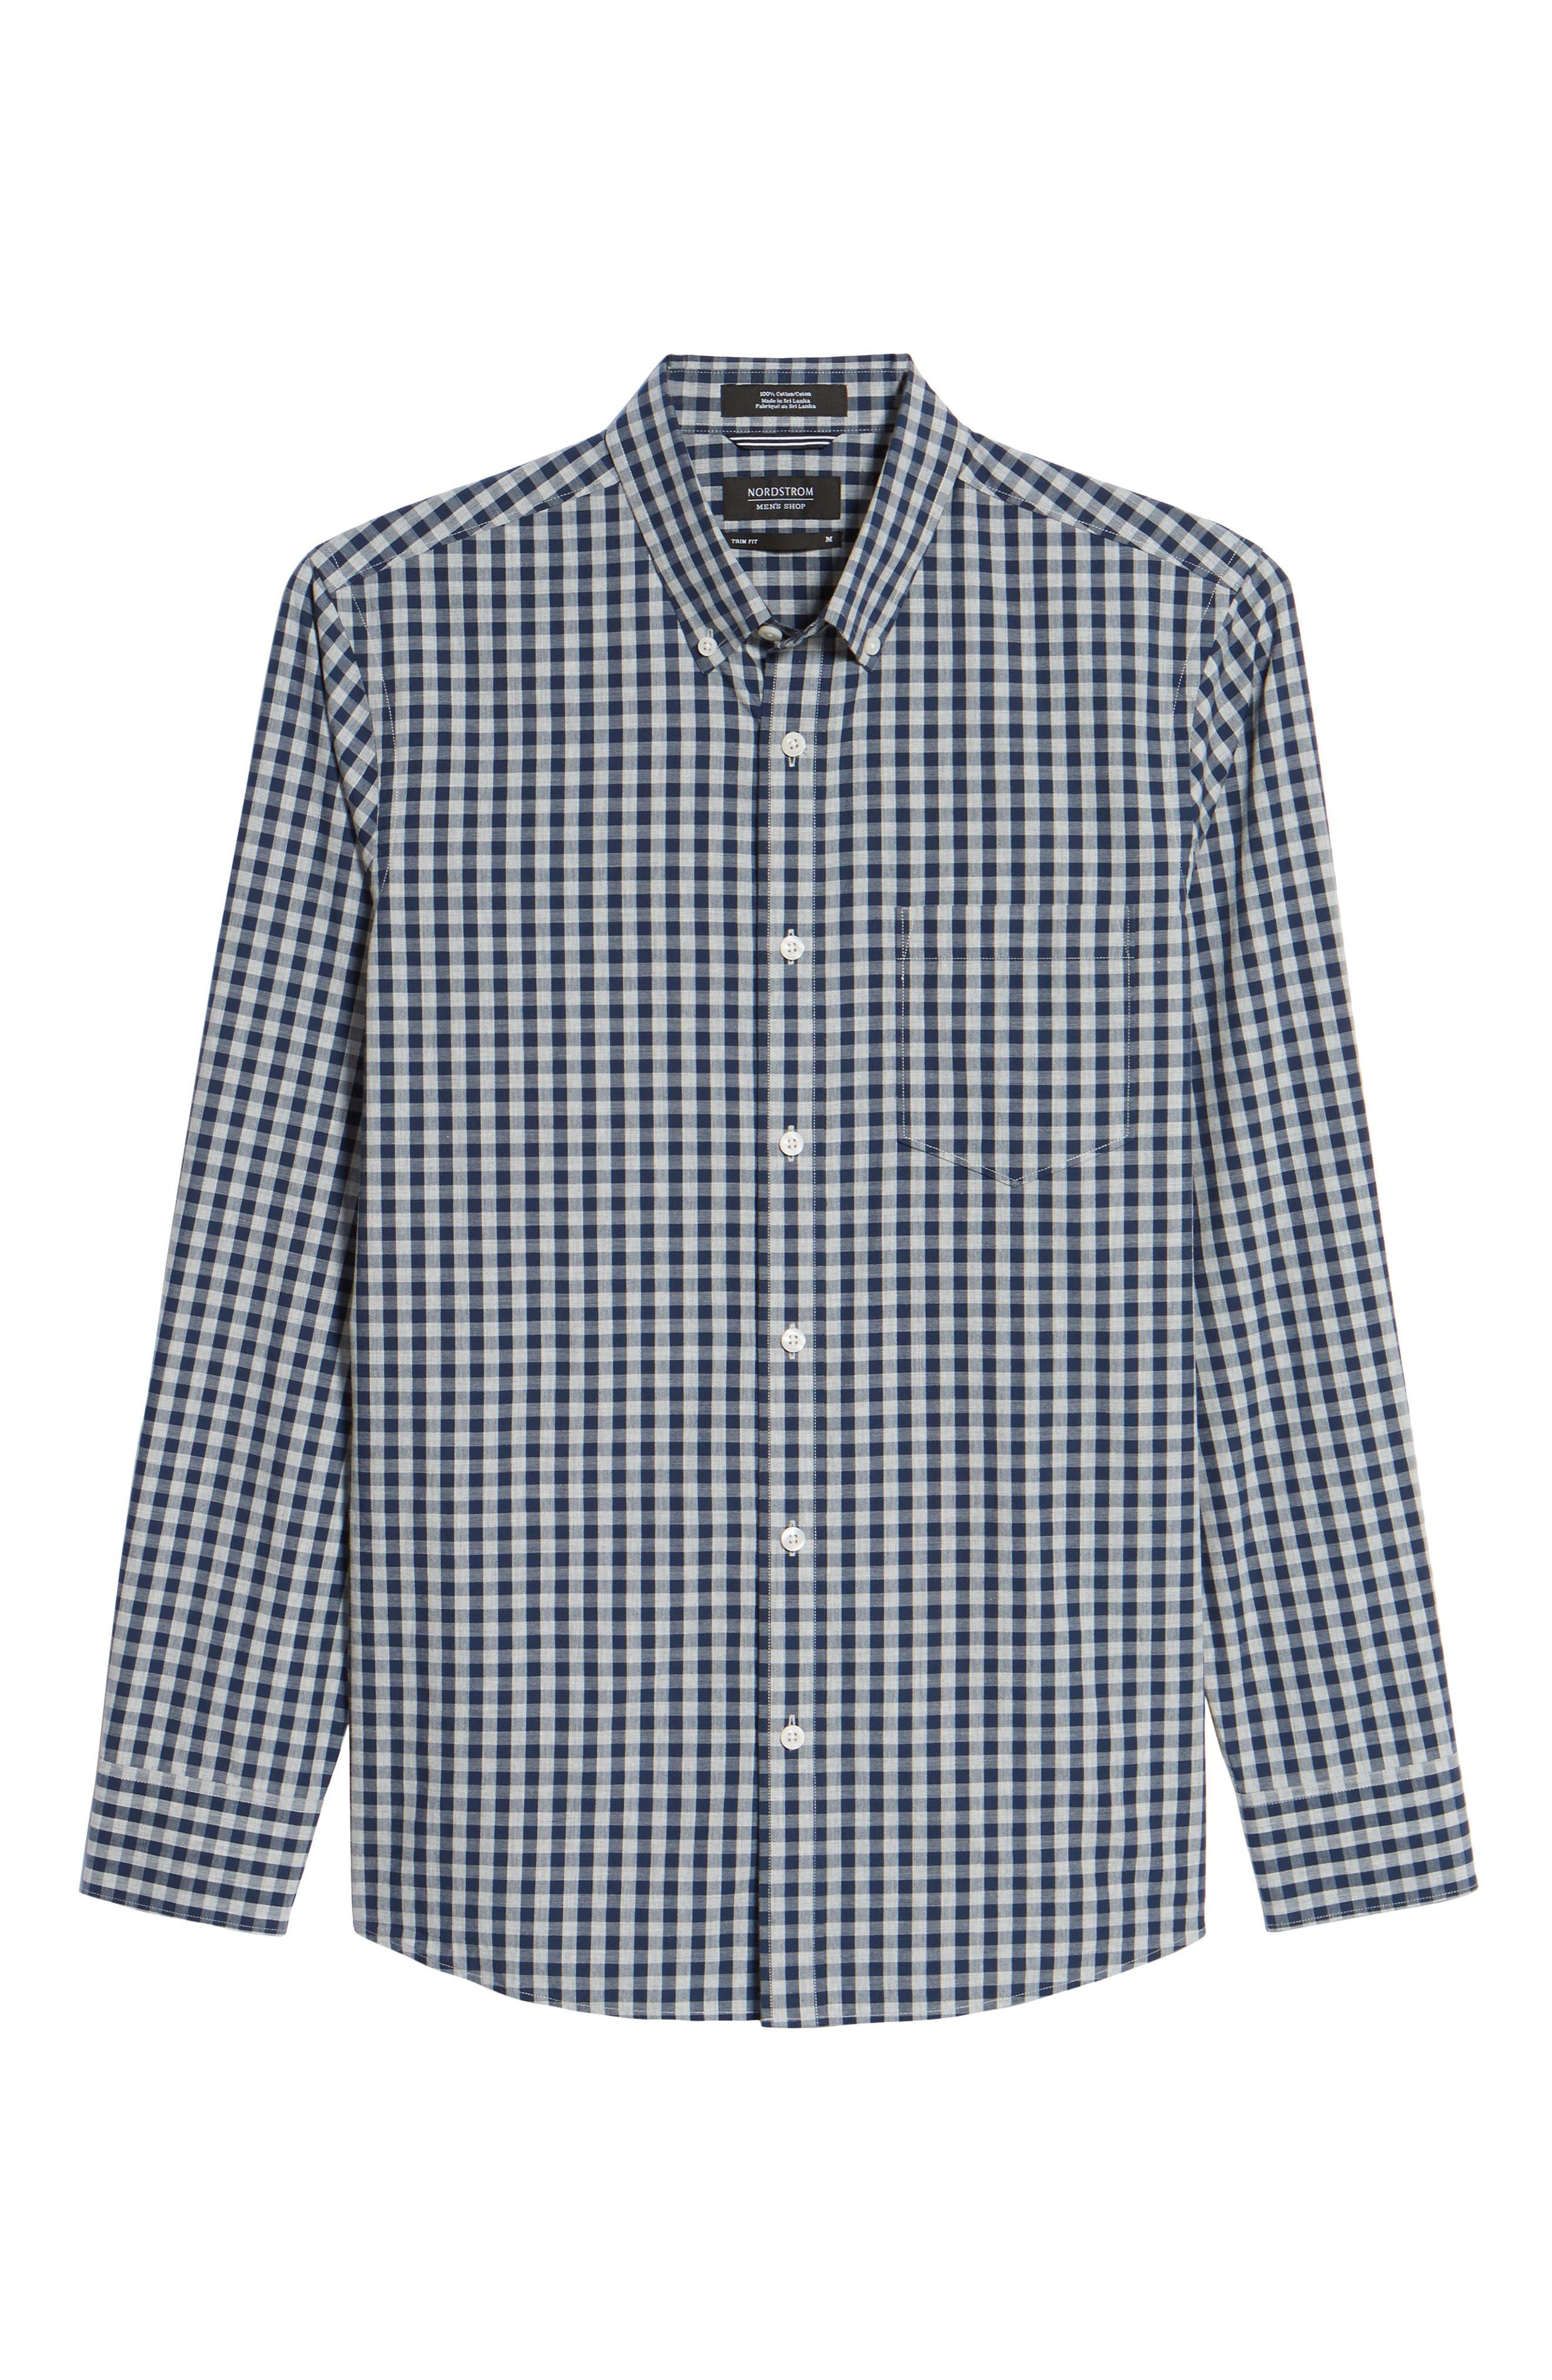 Spade Trim Fit Gingham Check Sport Shirt,                             Alternate thumbnail 6, color,                             Grey Shade Navy Gingham